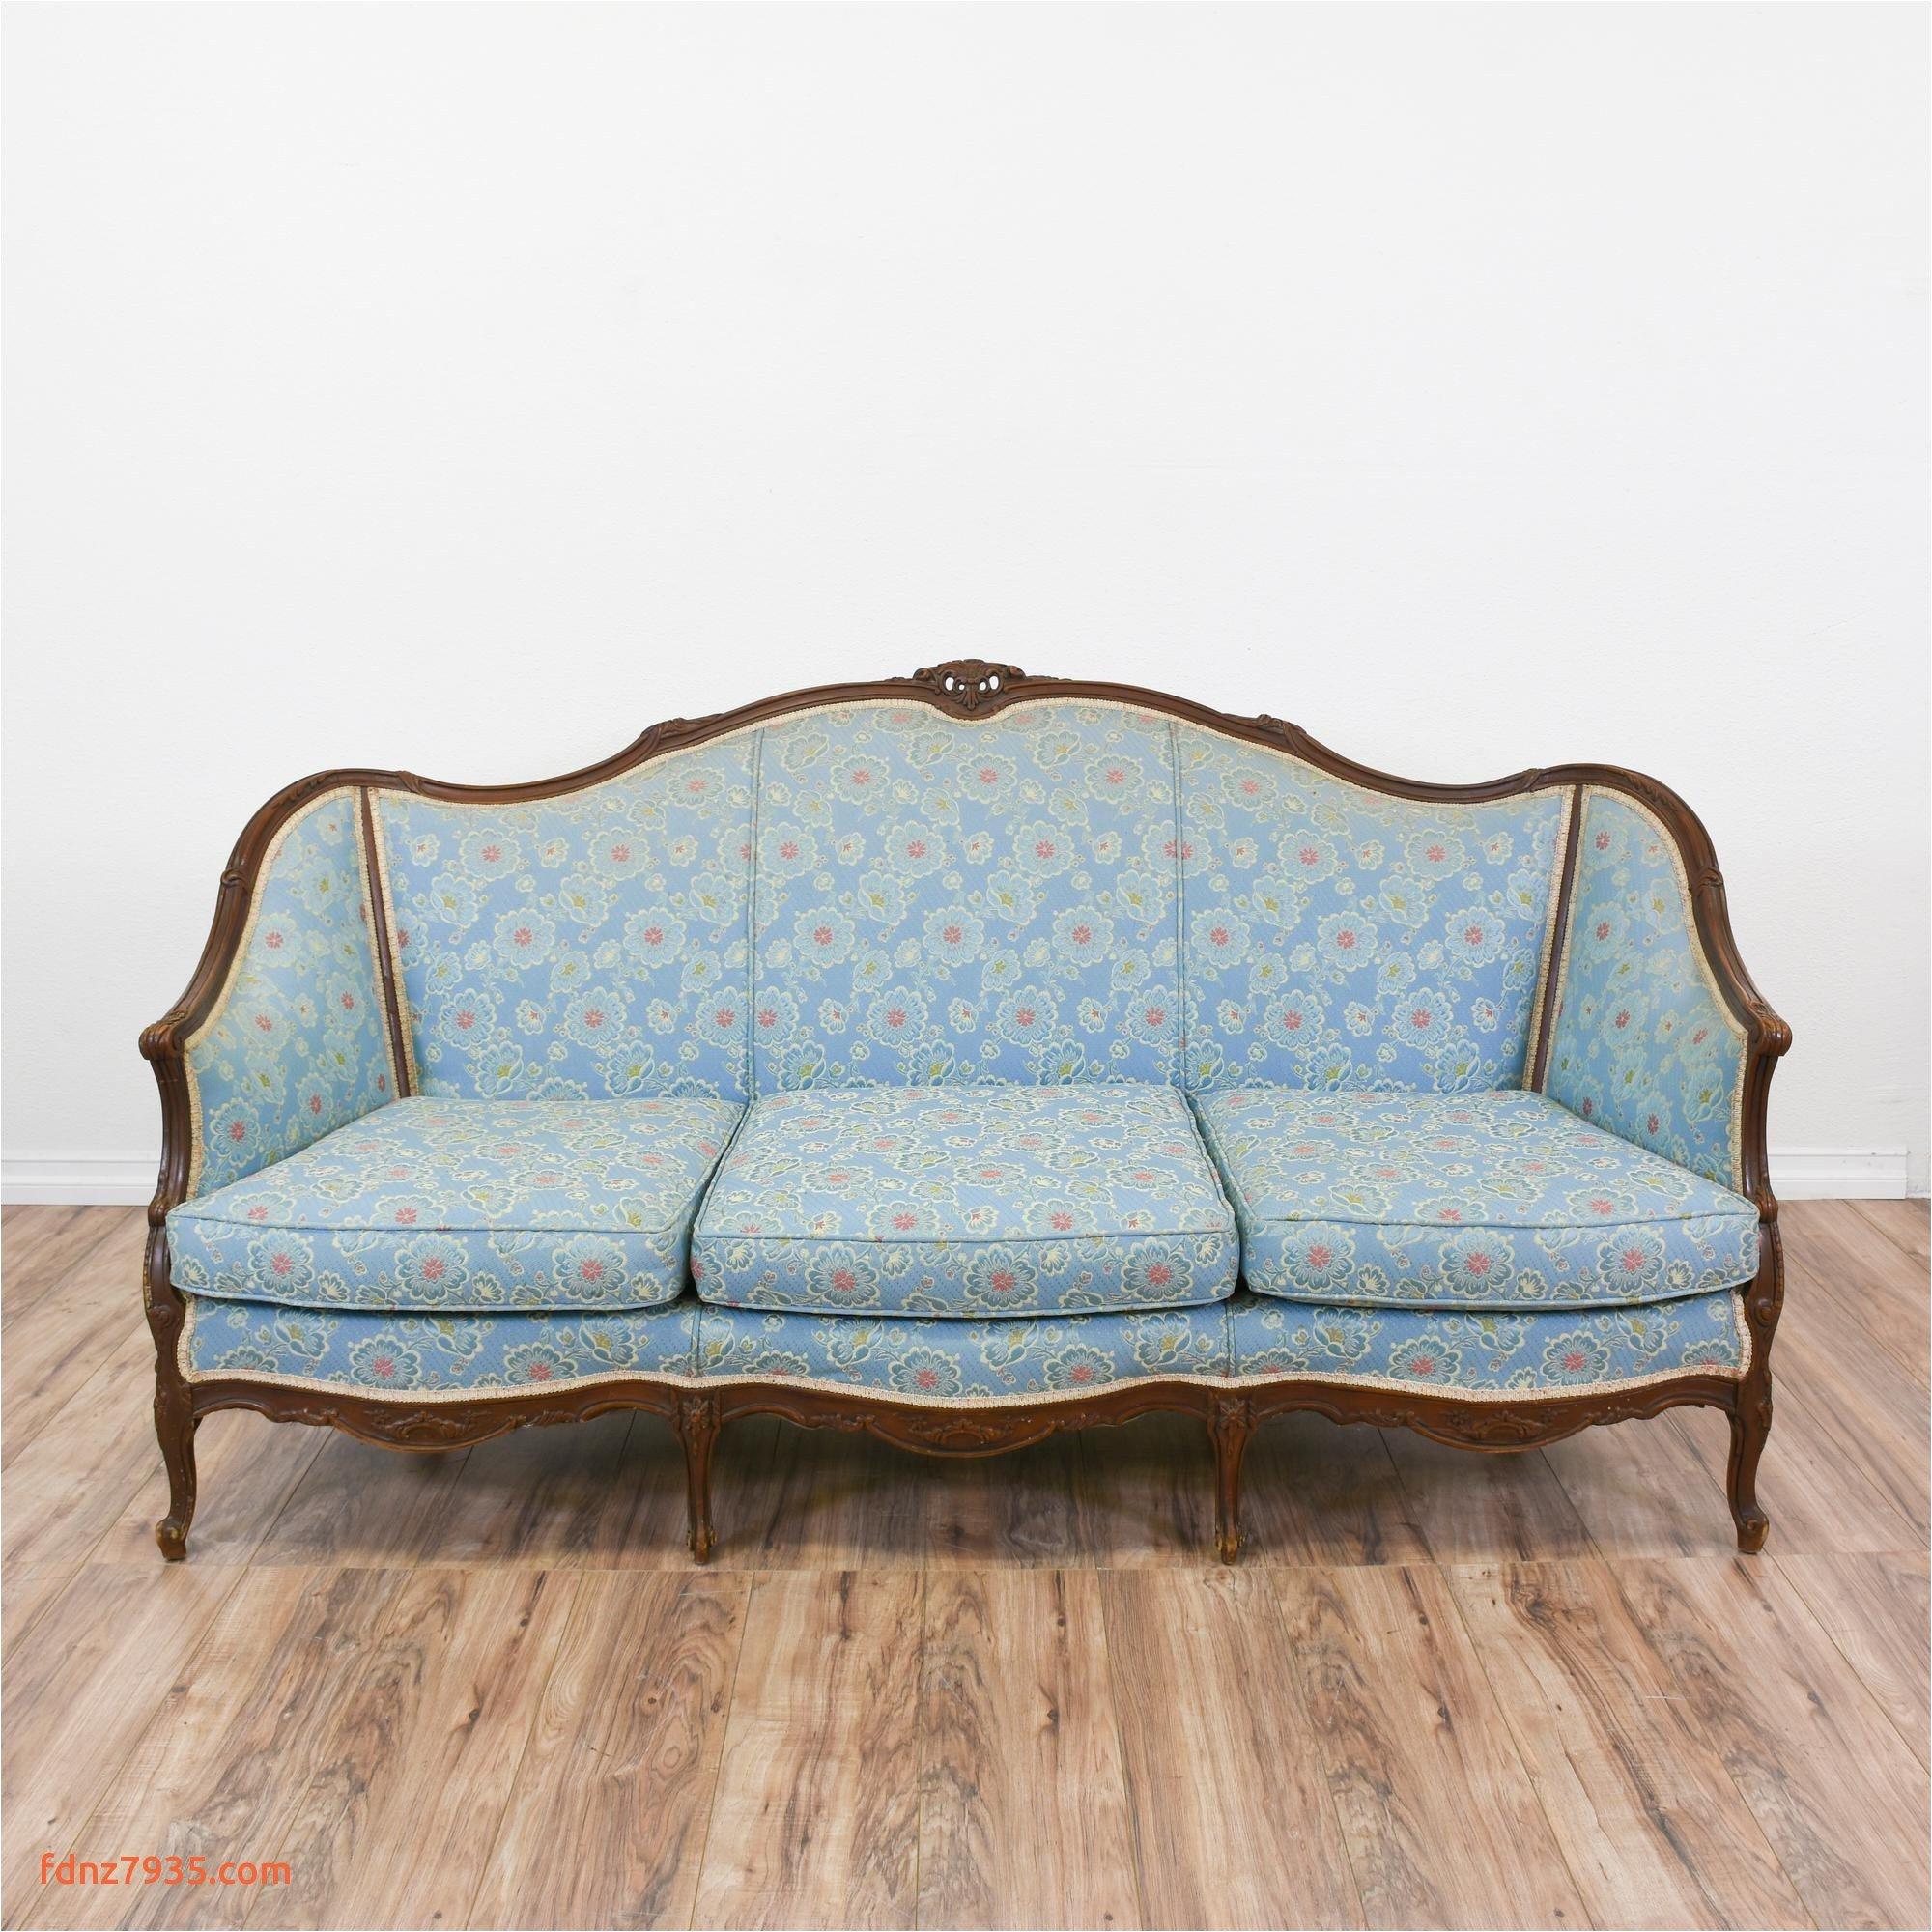 patio furniture covers sale inspirational wicker outdoor sofa 0d concept restoration hardware furniture sale